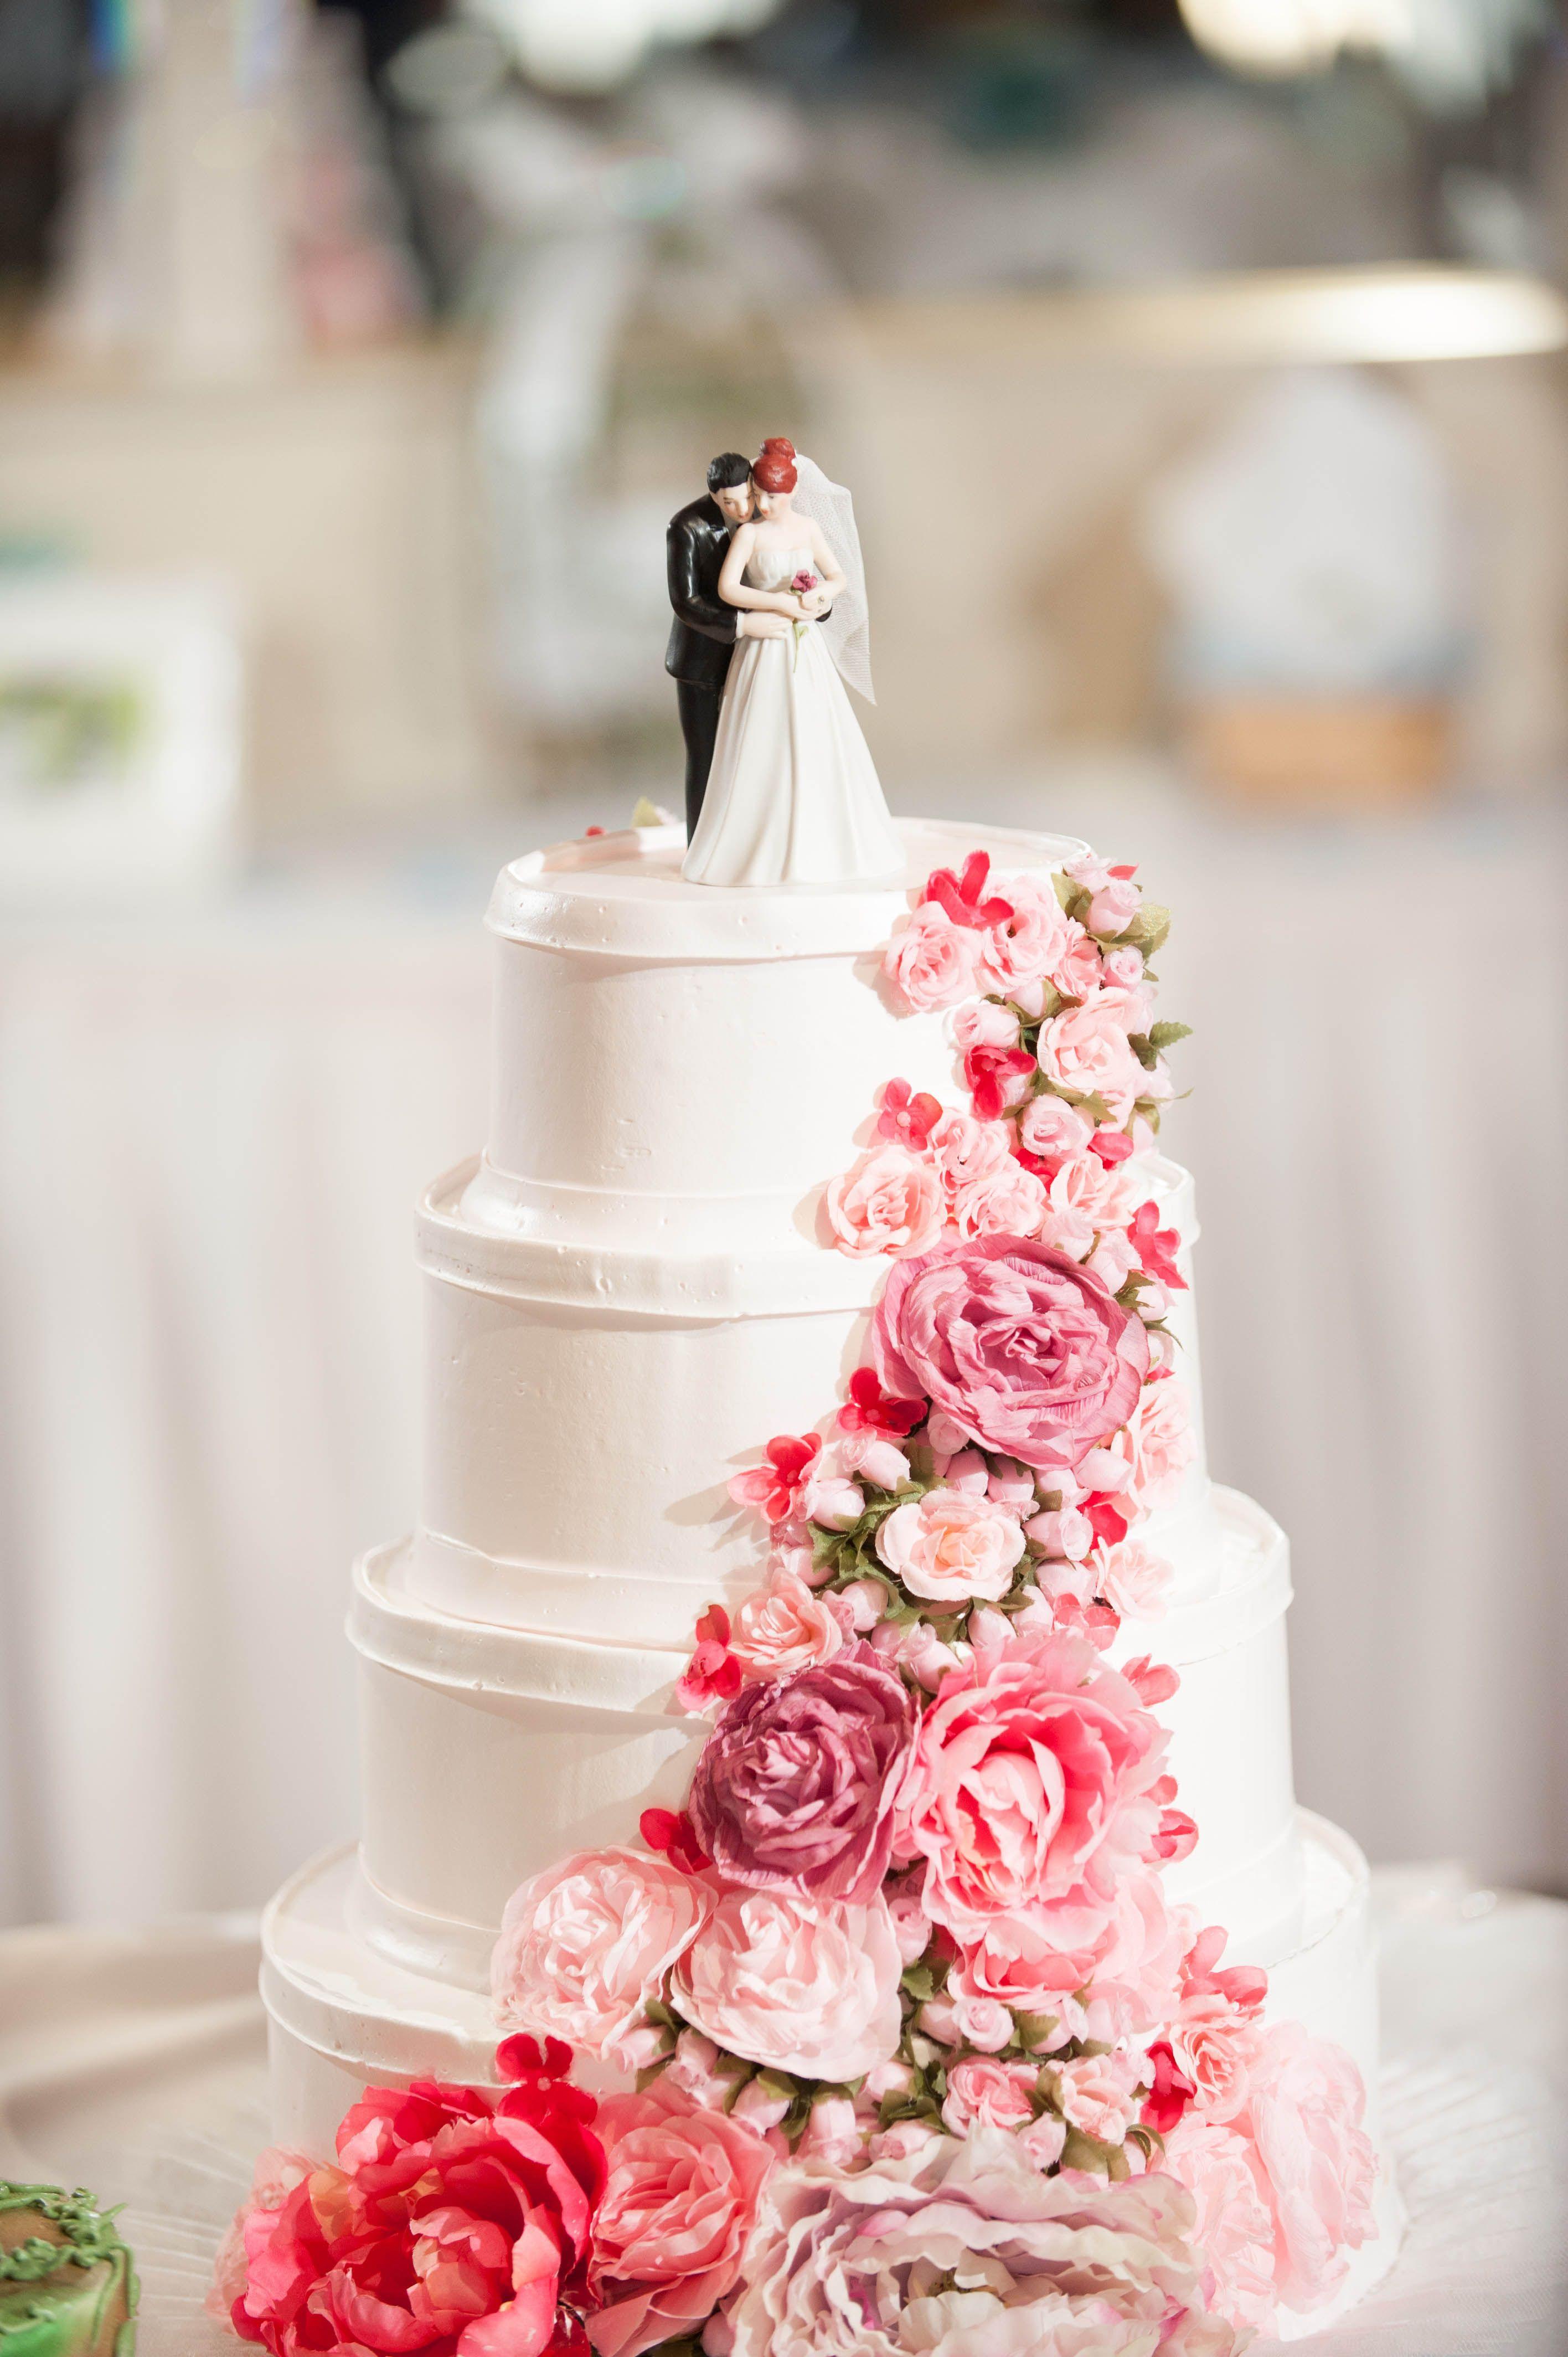 New Wedding Ring Cake topper | Wedding